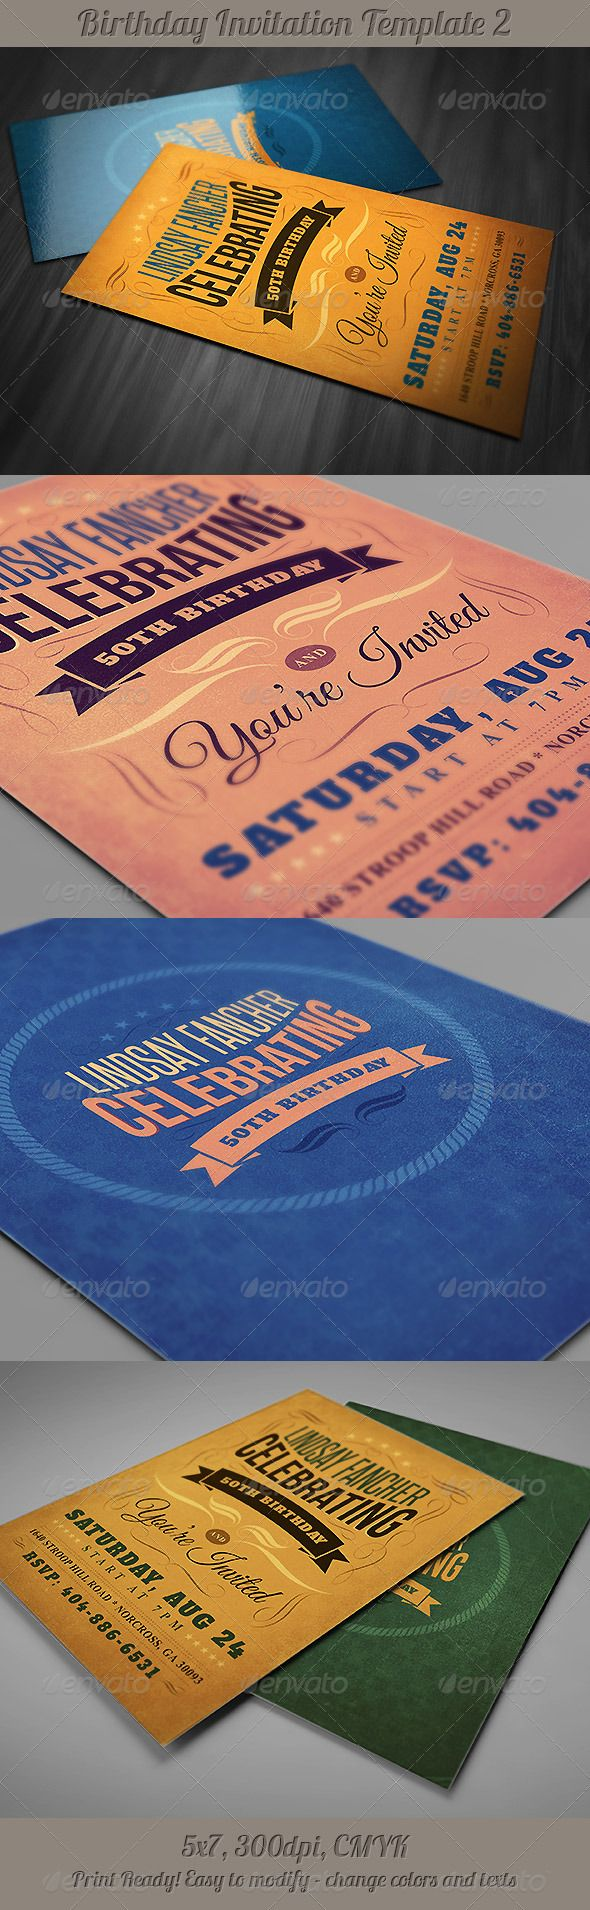 Retro Birthday Invitation 2 - Invitations Cards & Invites